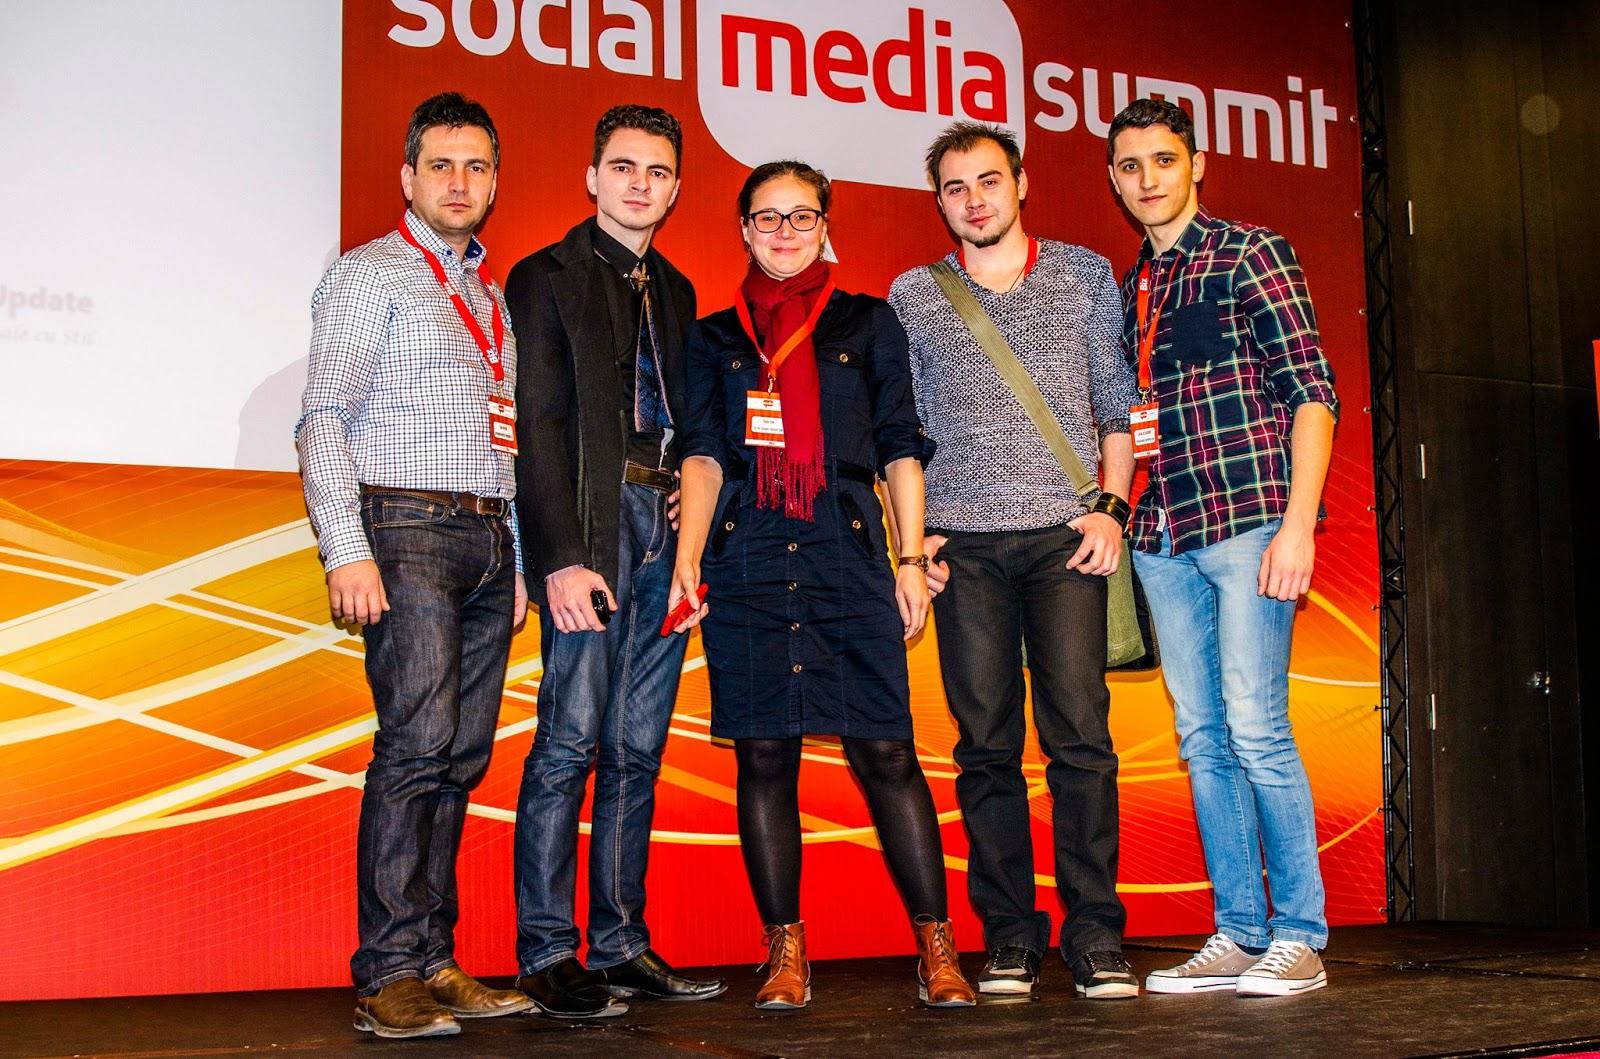 Am susținut blogosfera constănțeană participând la Social Media Summit 2015